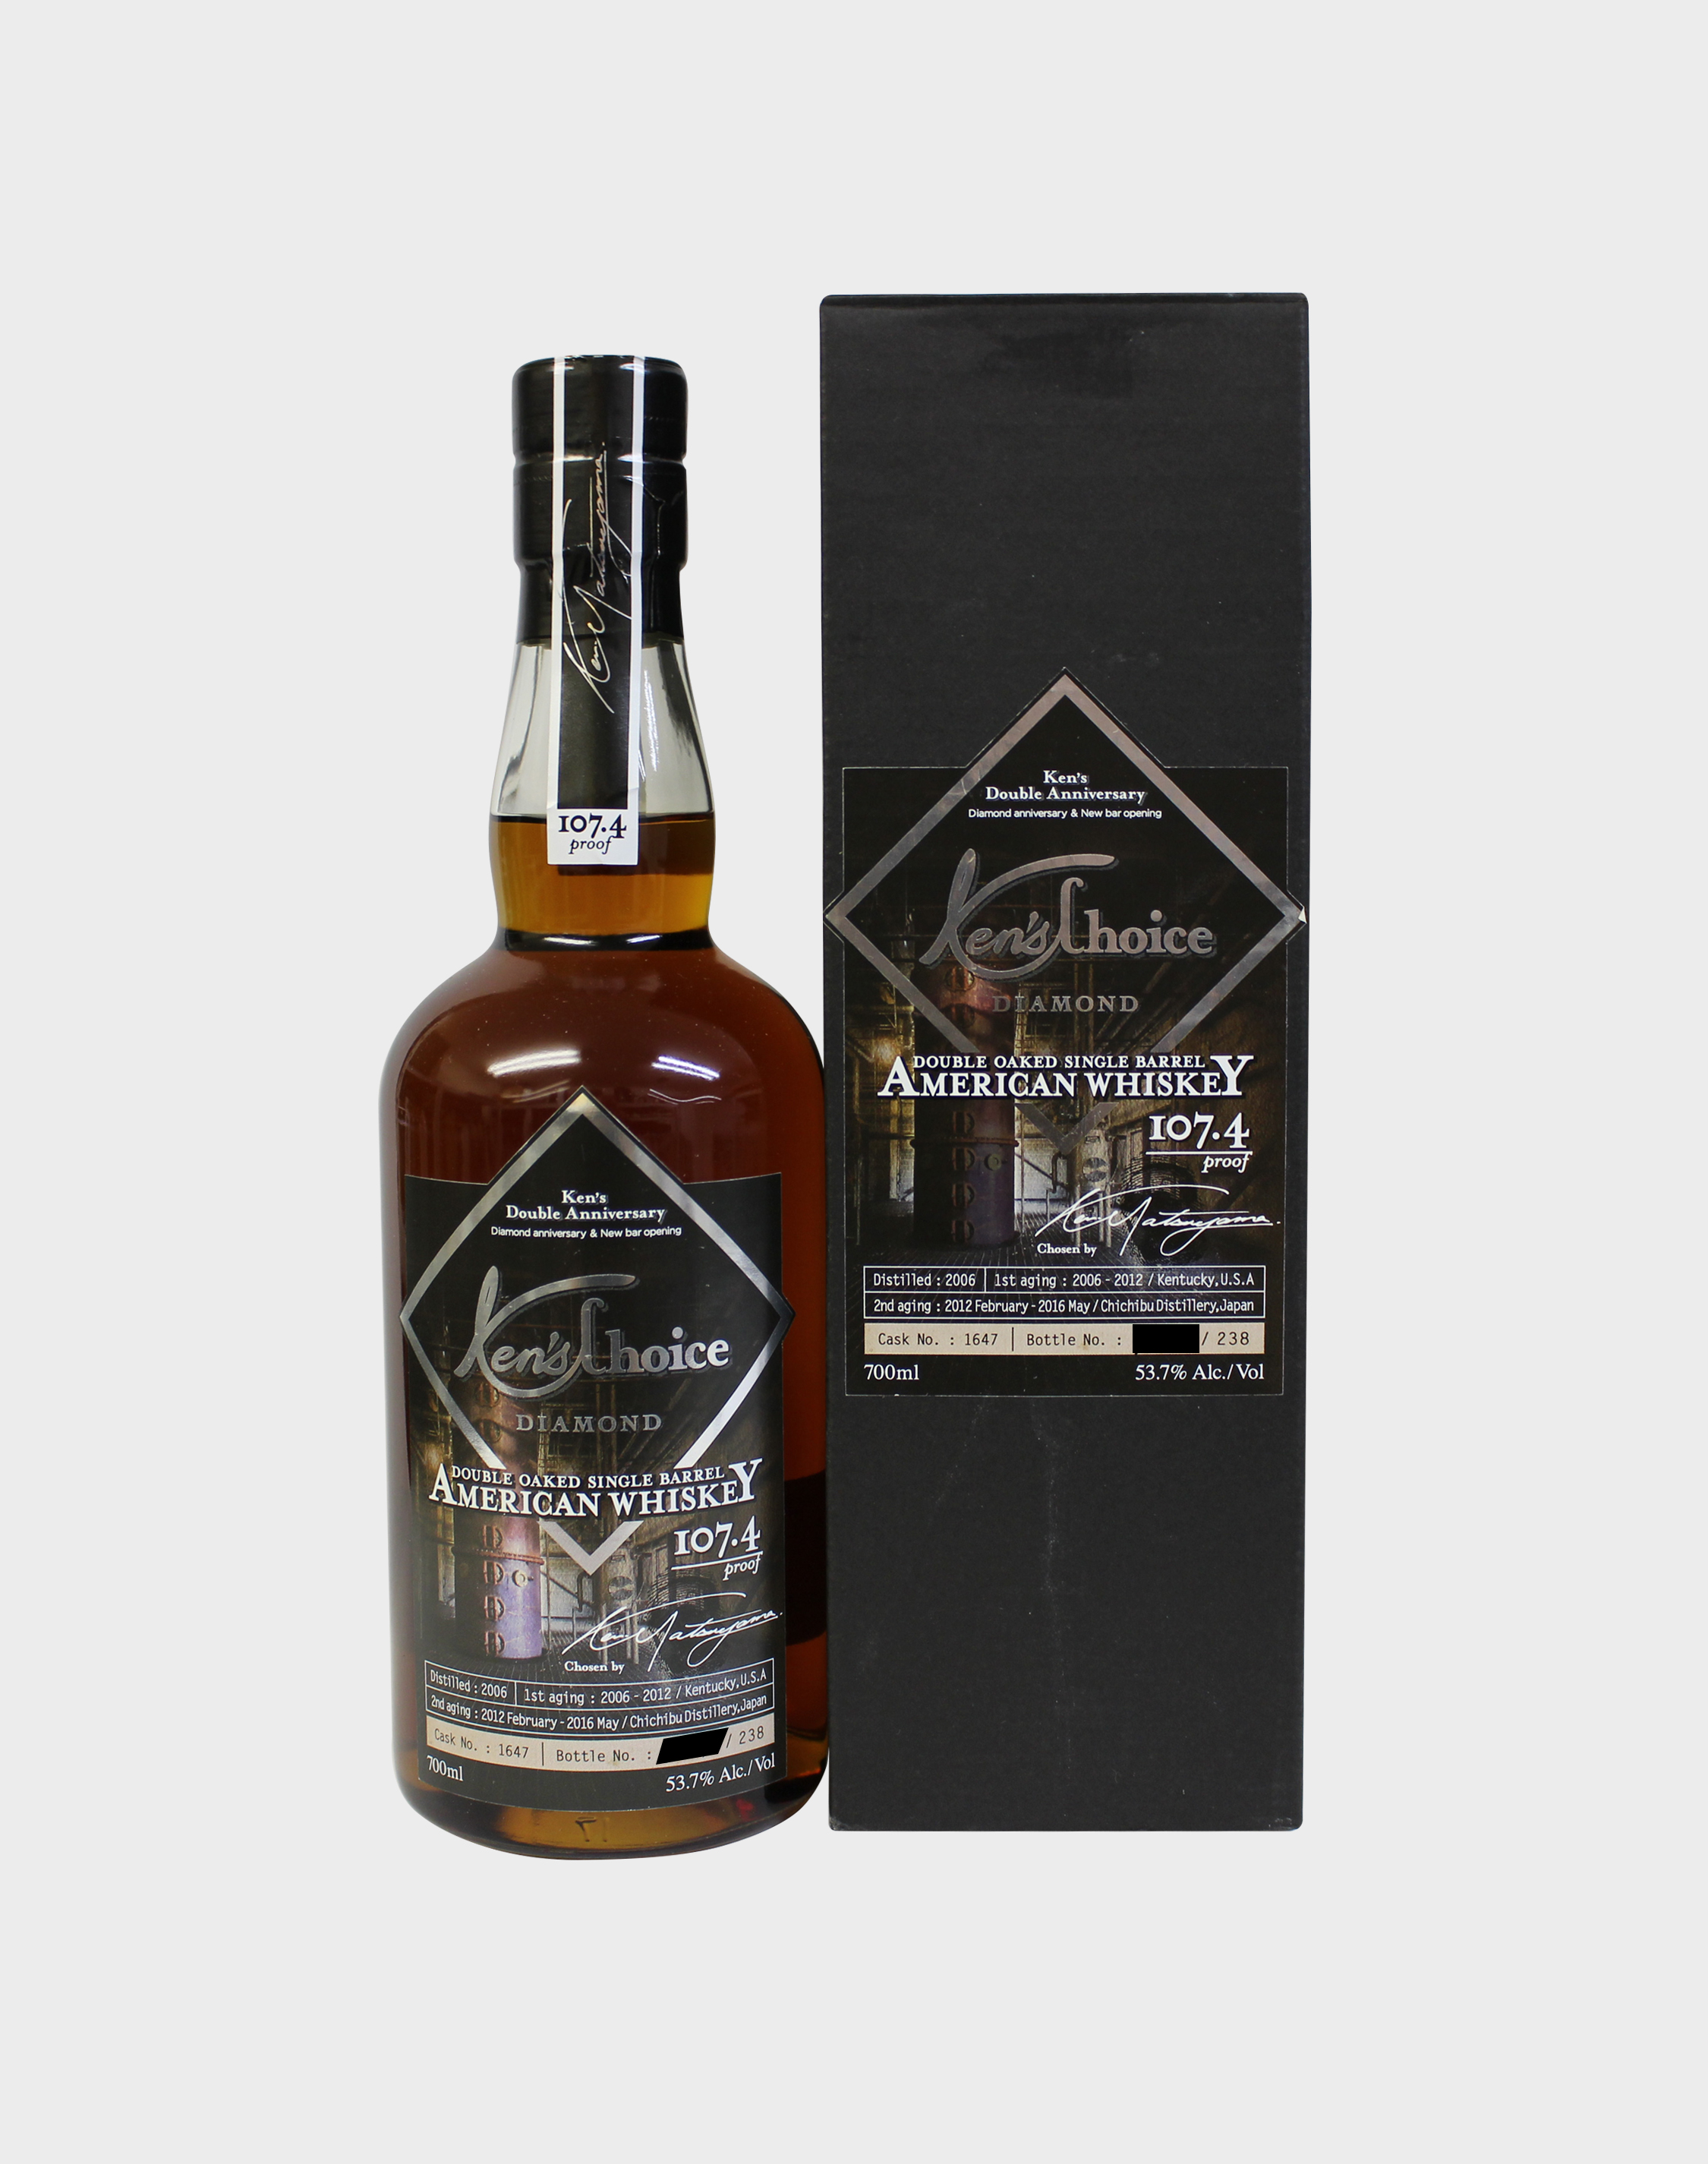 Ichiro's Malt Ken's Choice Diamond American Whisky Double Anniversary